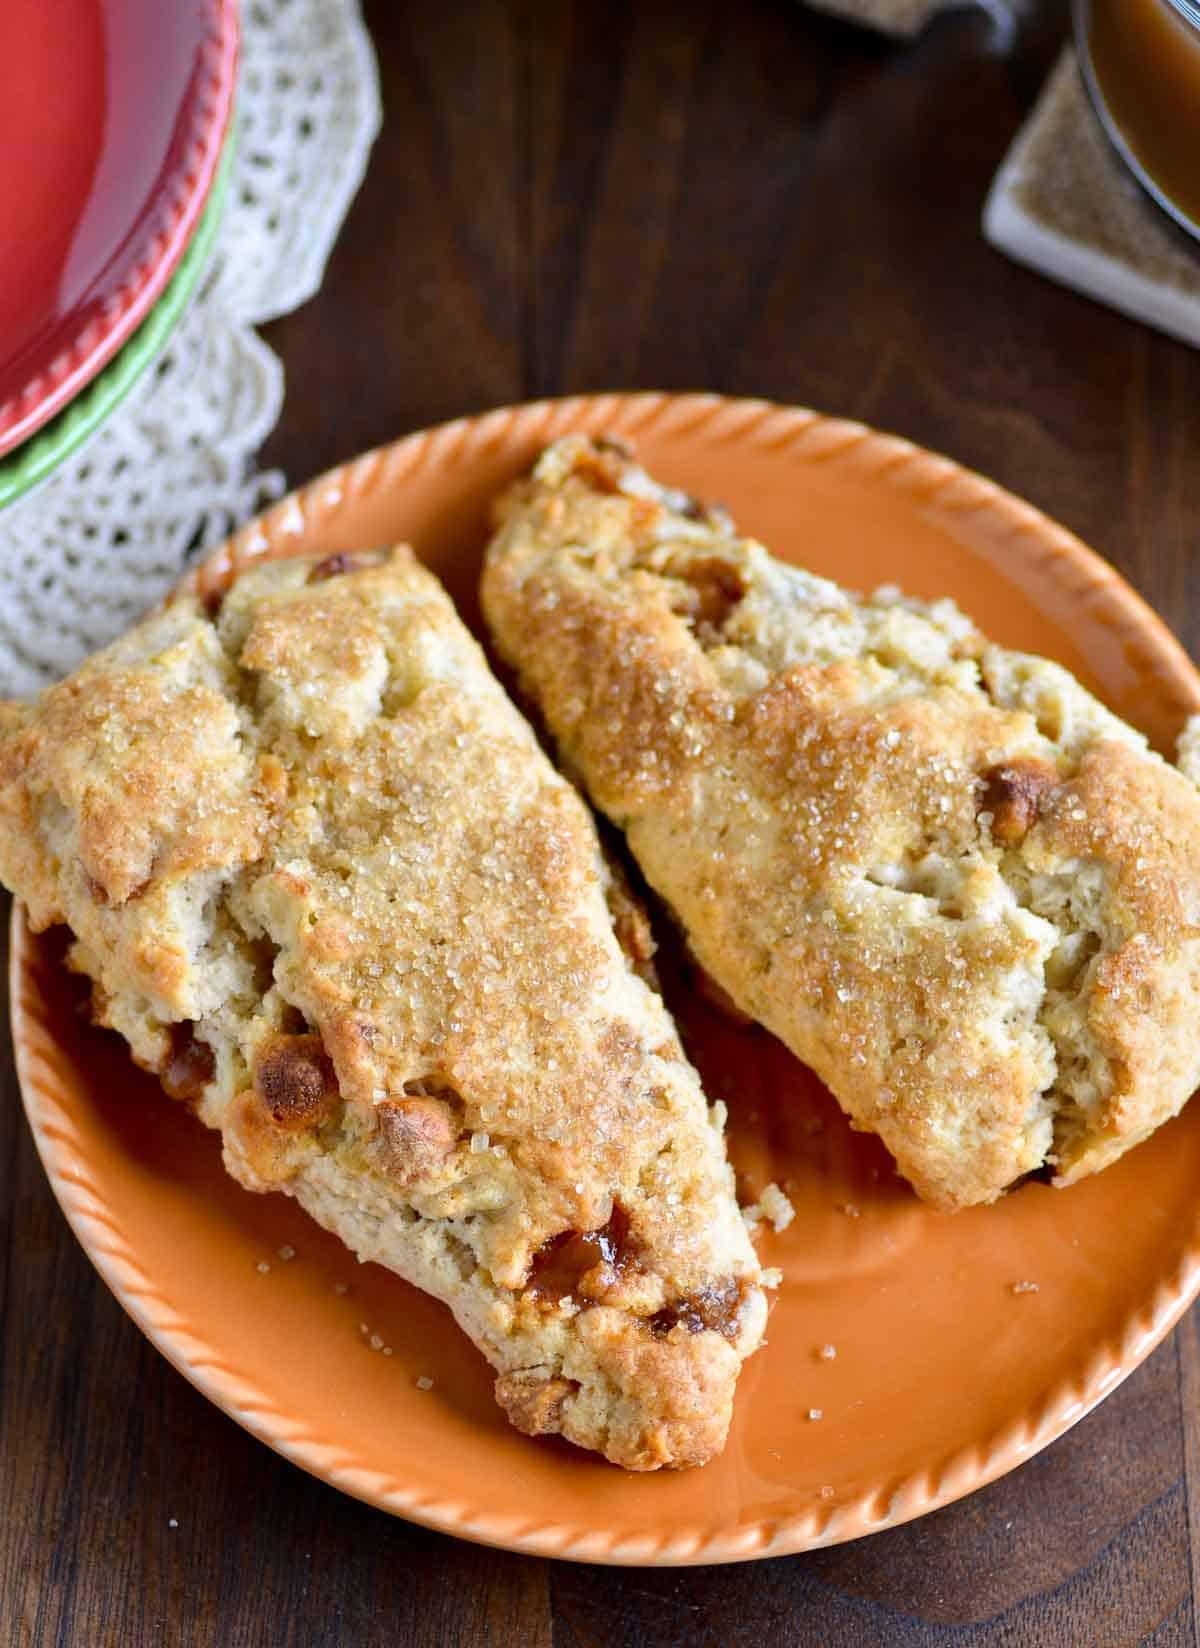 two apple pie scones on an orange plate